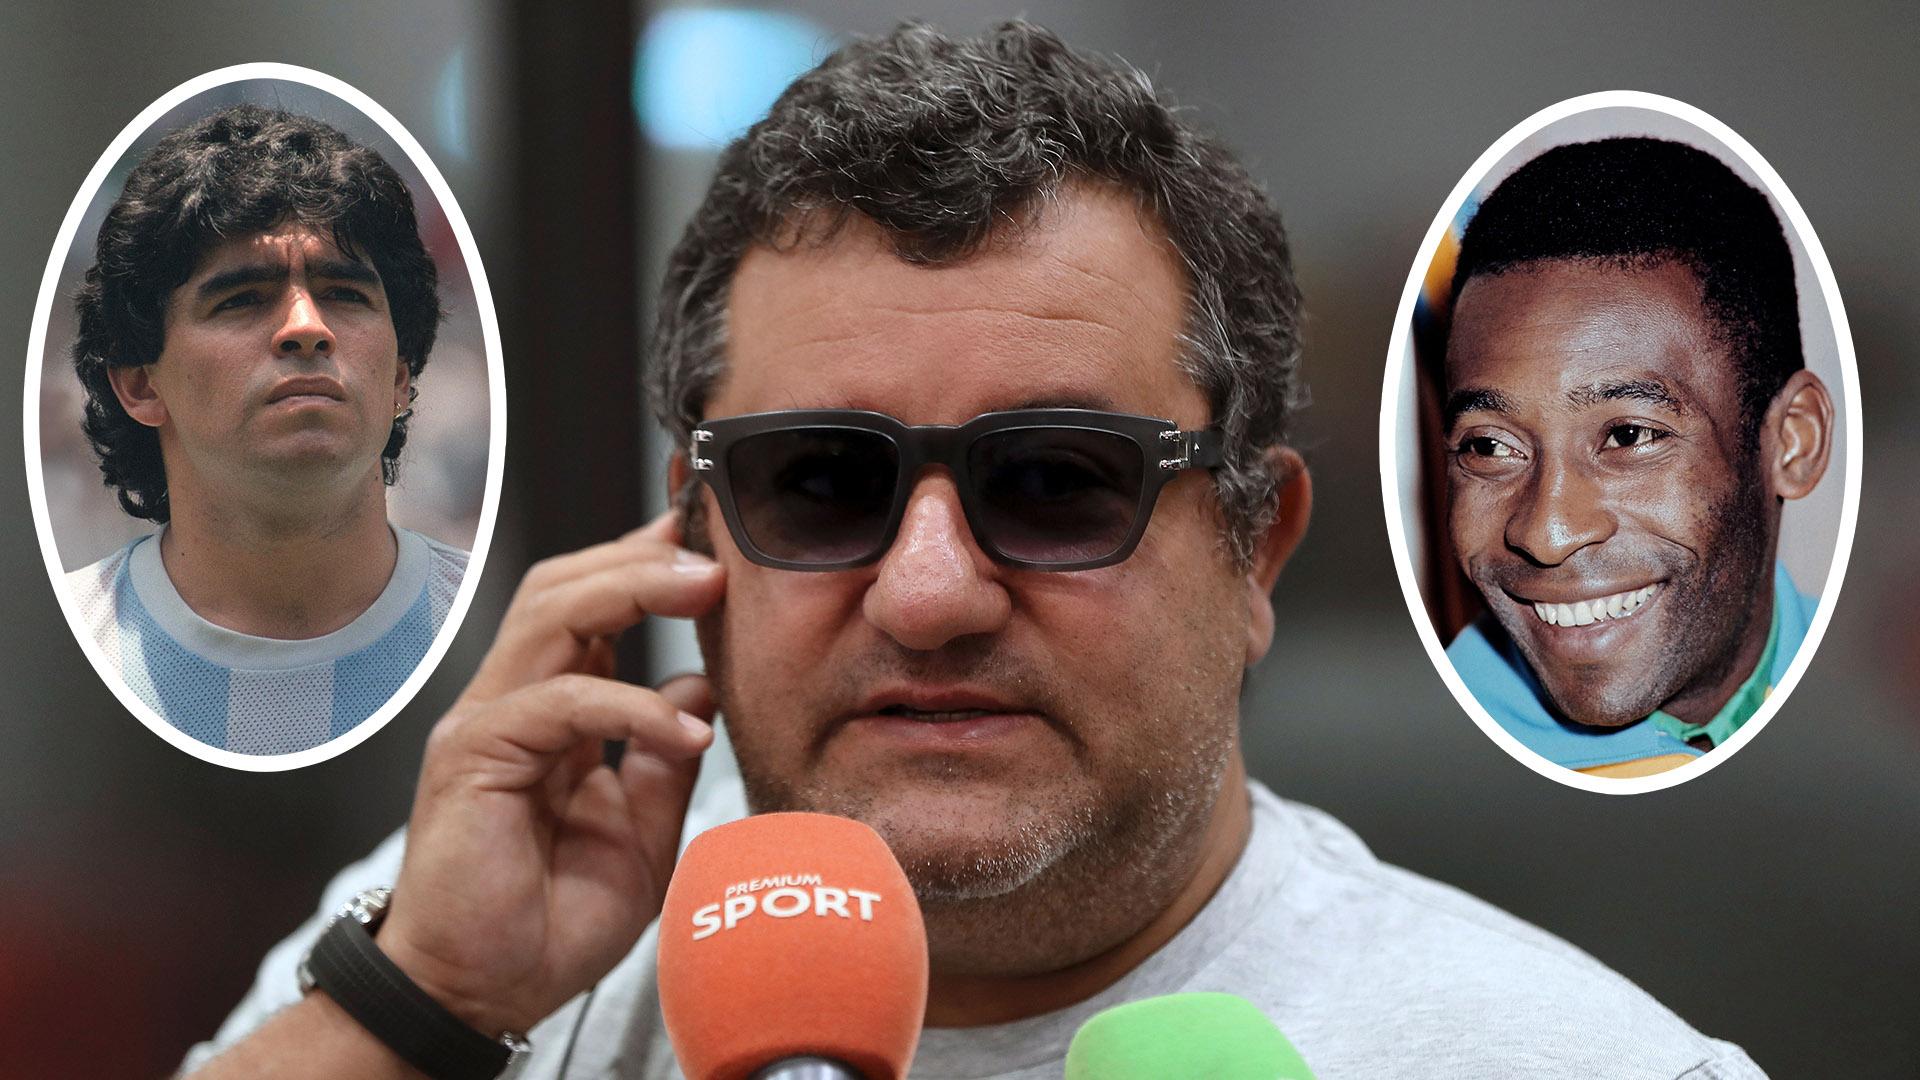 'Man Utd would ruin even Maradona & Pele!' — Raiola slams Red Devils & says he won't send players there